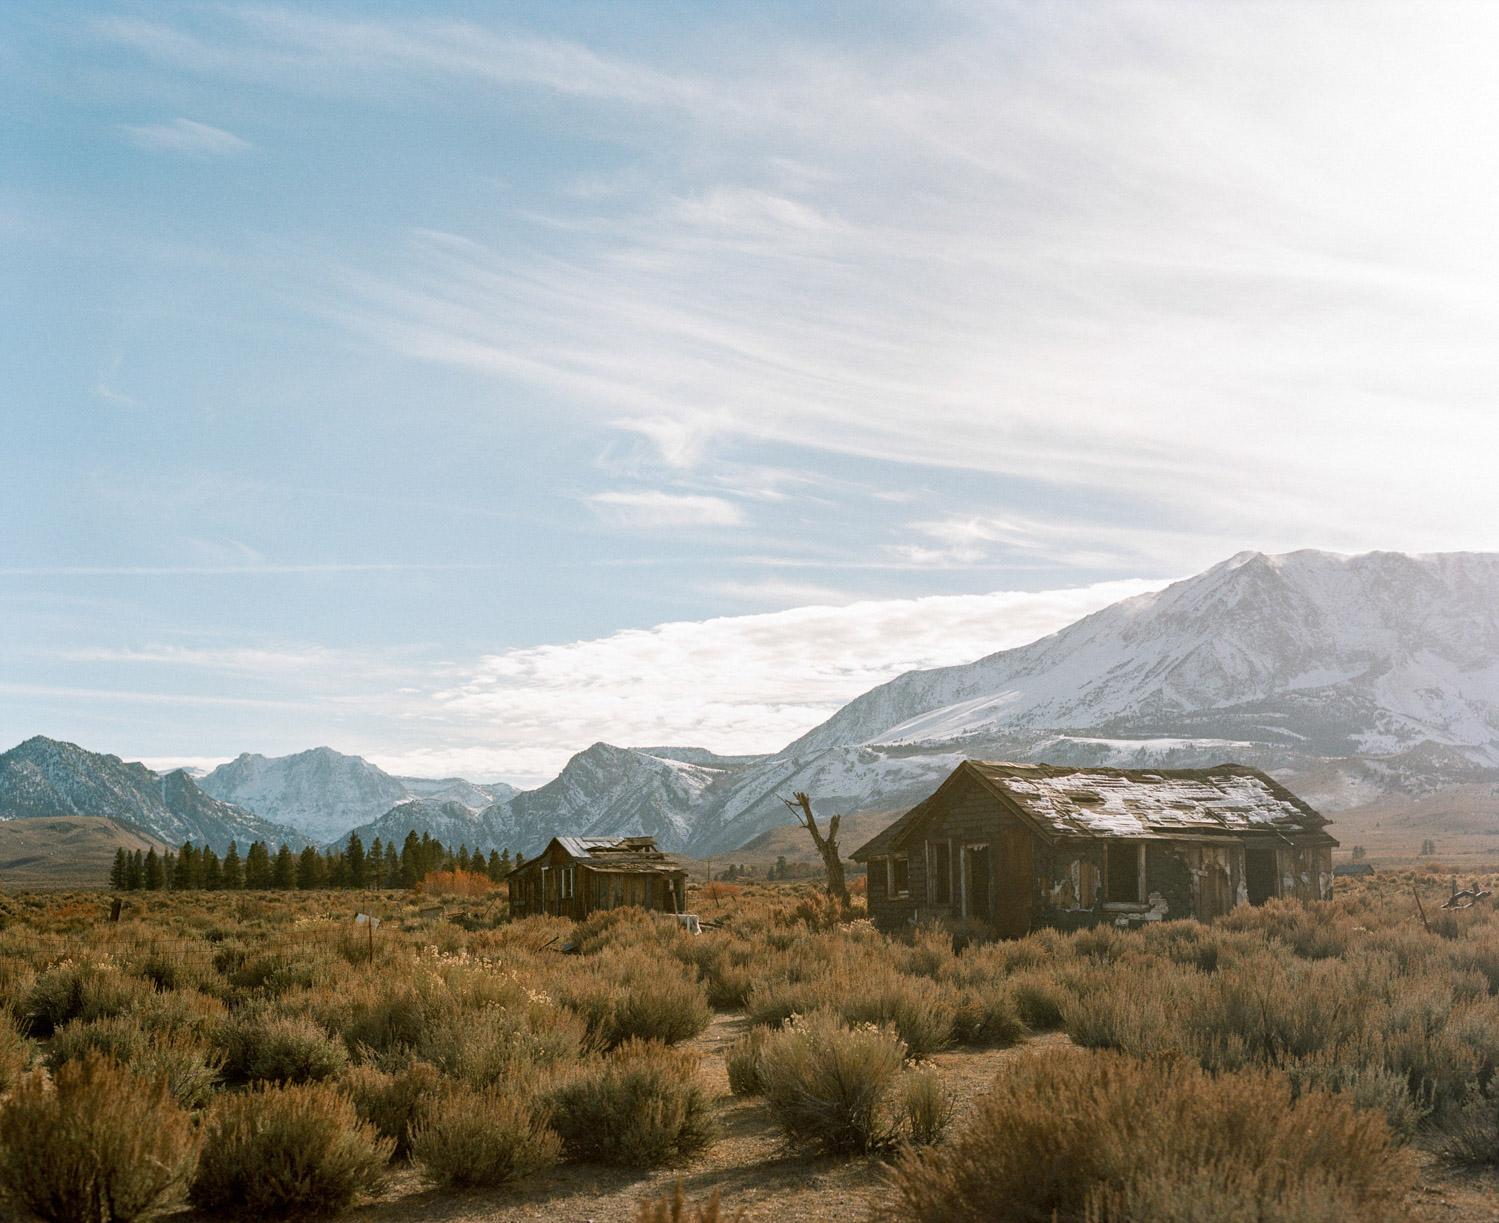 deserted cabins in Yosemite